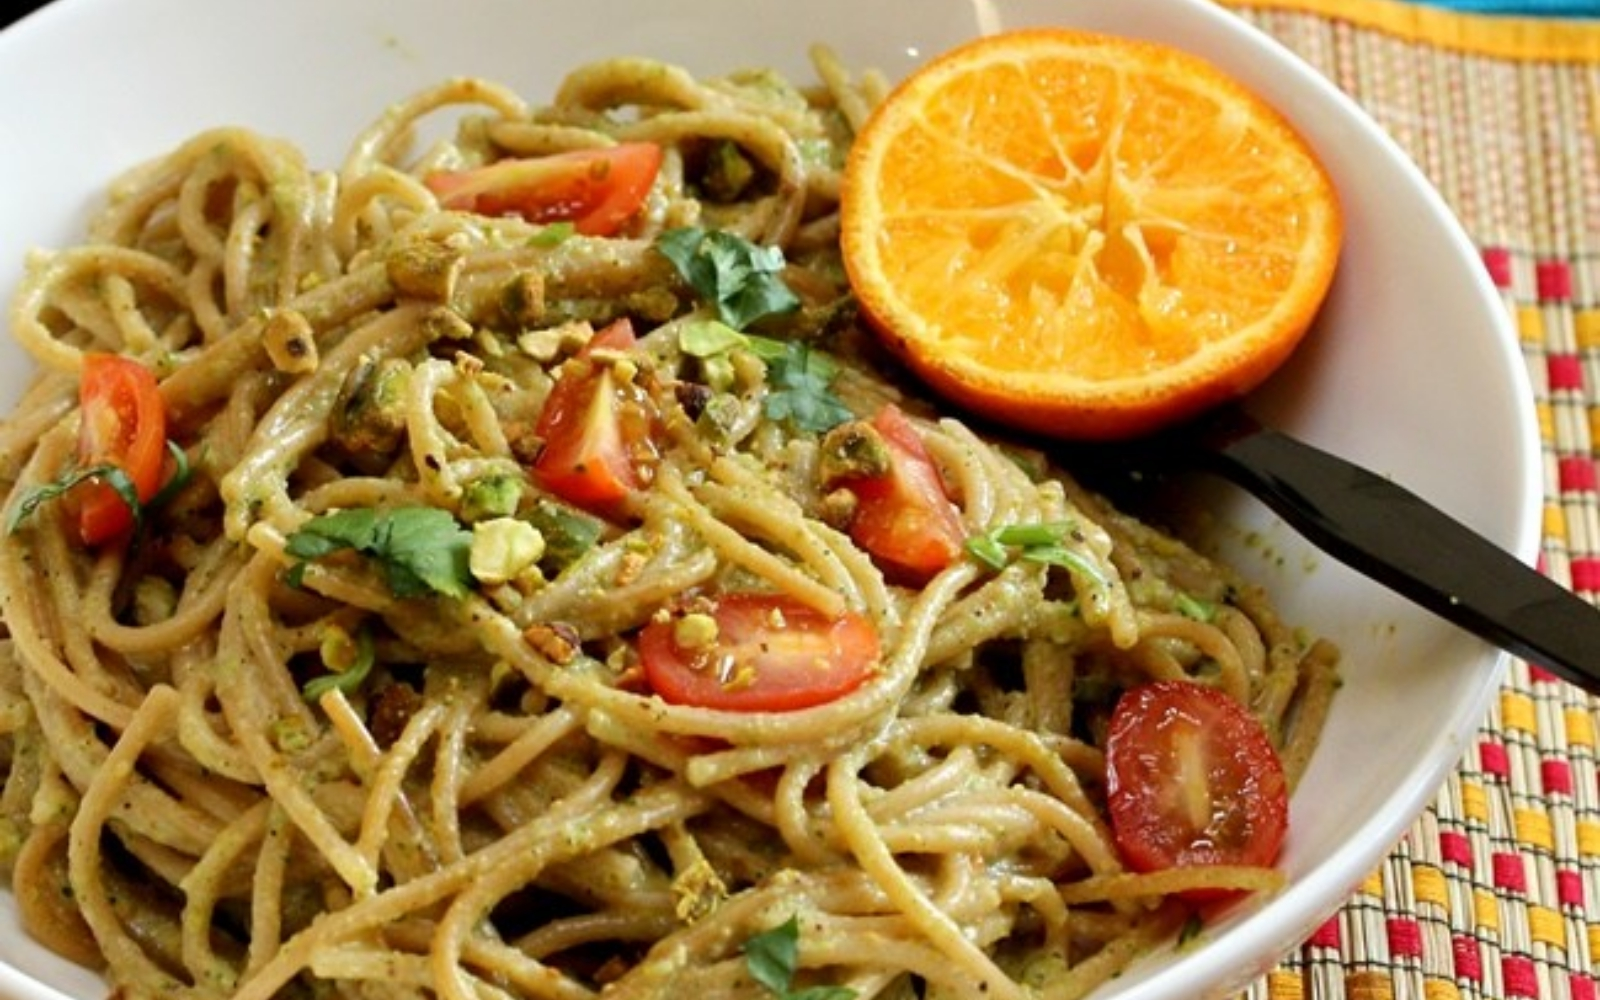 Vegan Pistachios and Broccoli Pesto with Whole Wheat Spaghetti